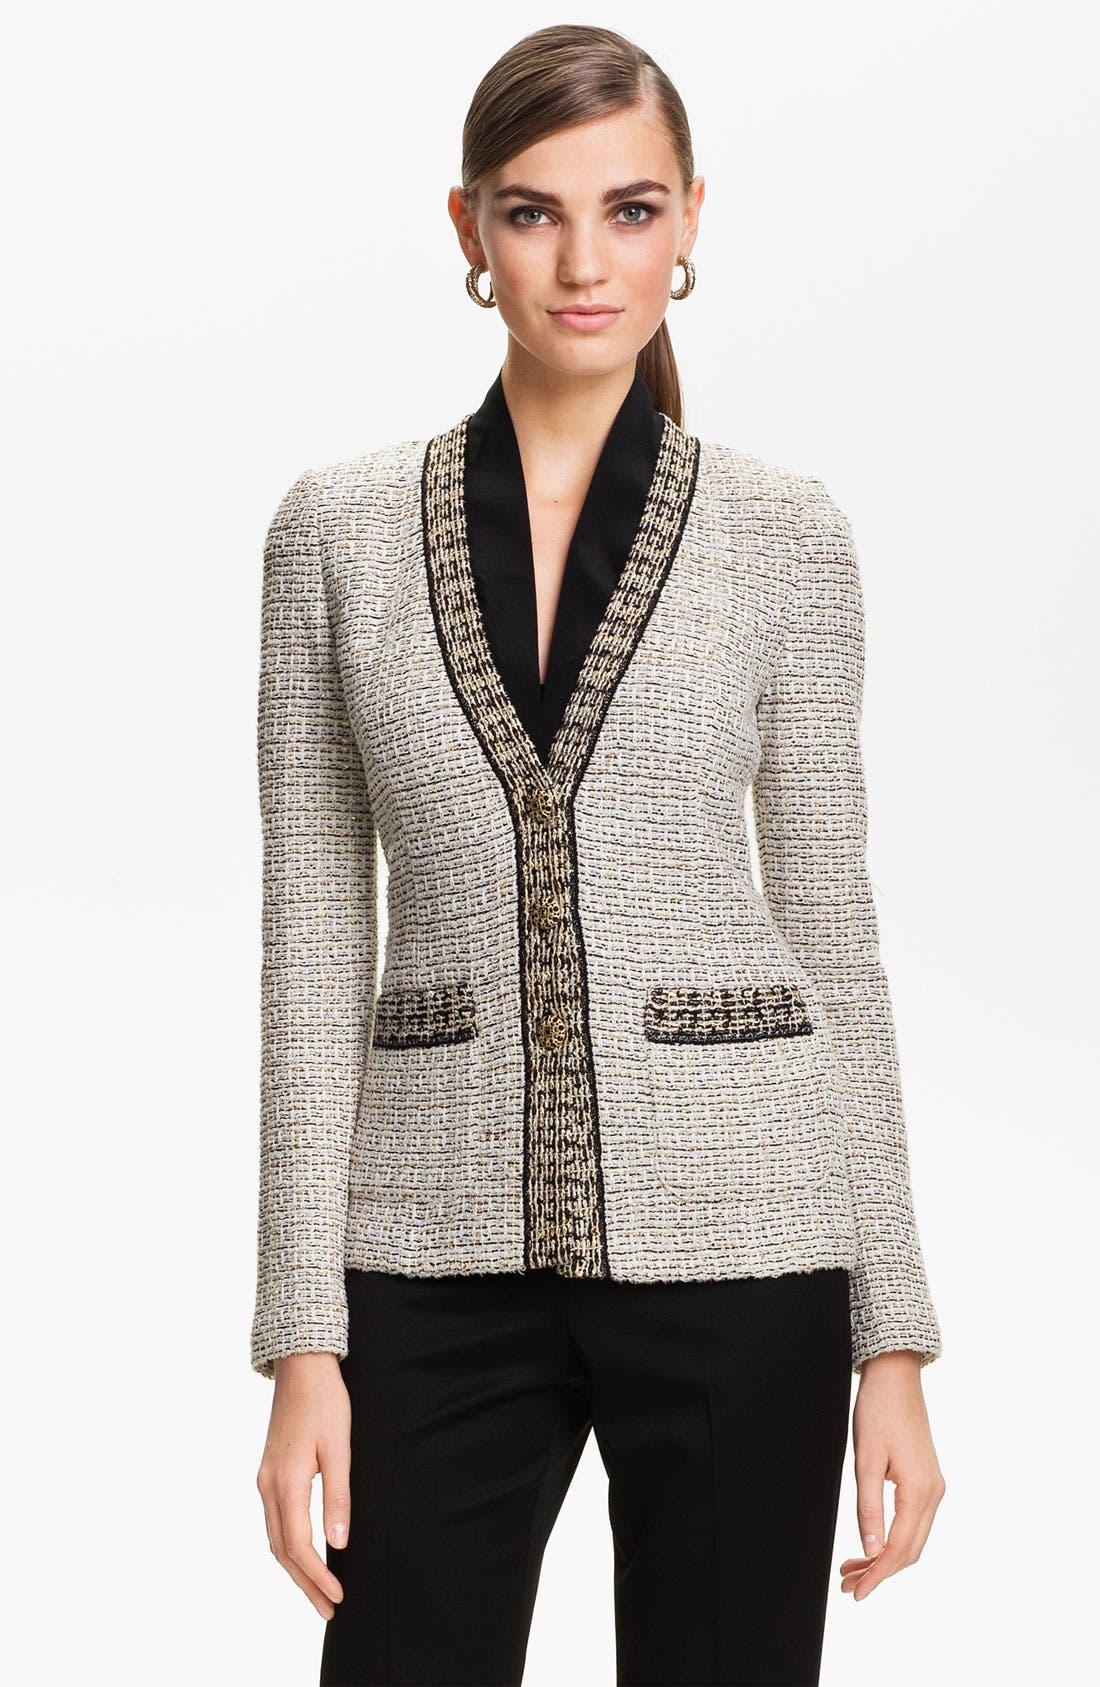 Alternate Image 1 Selected - St. John Collection Venezia Tweed Knit Jacket